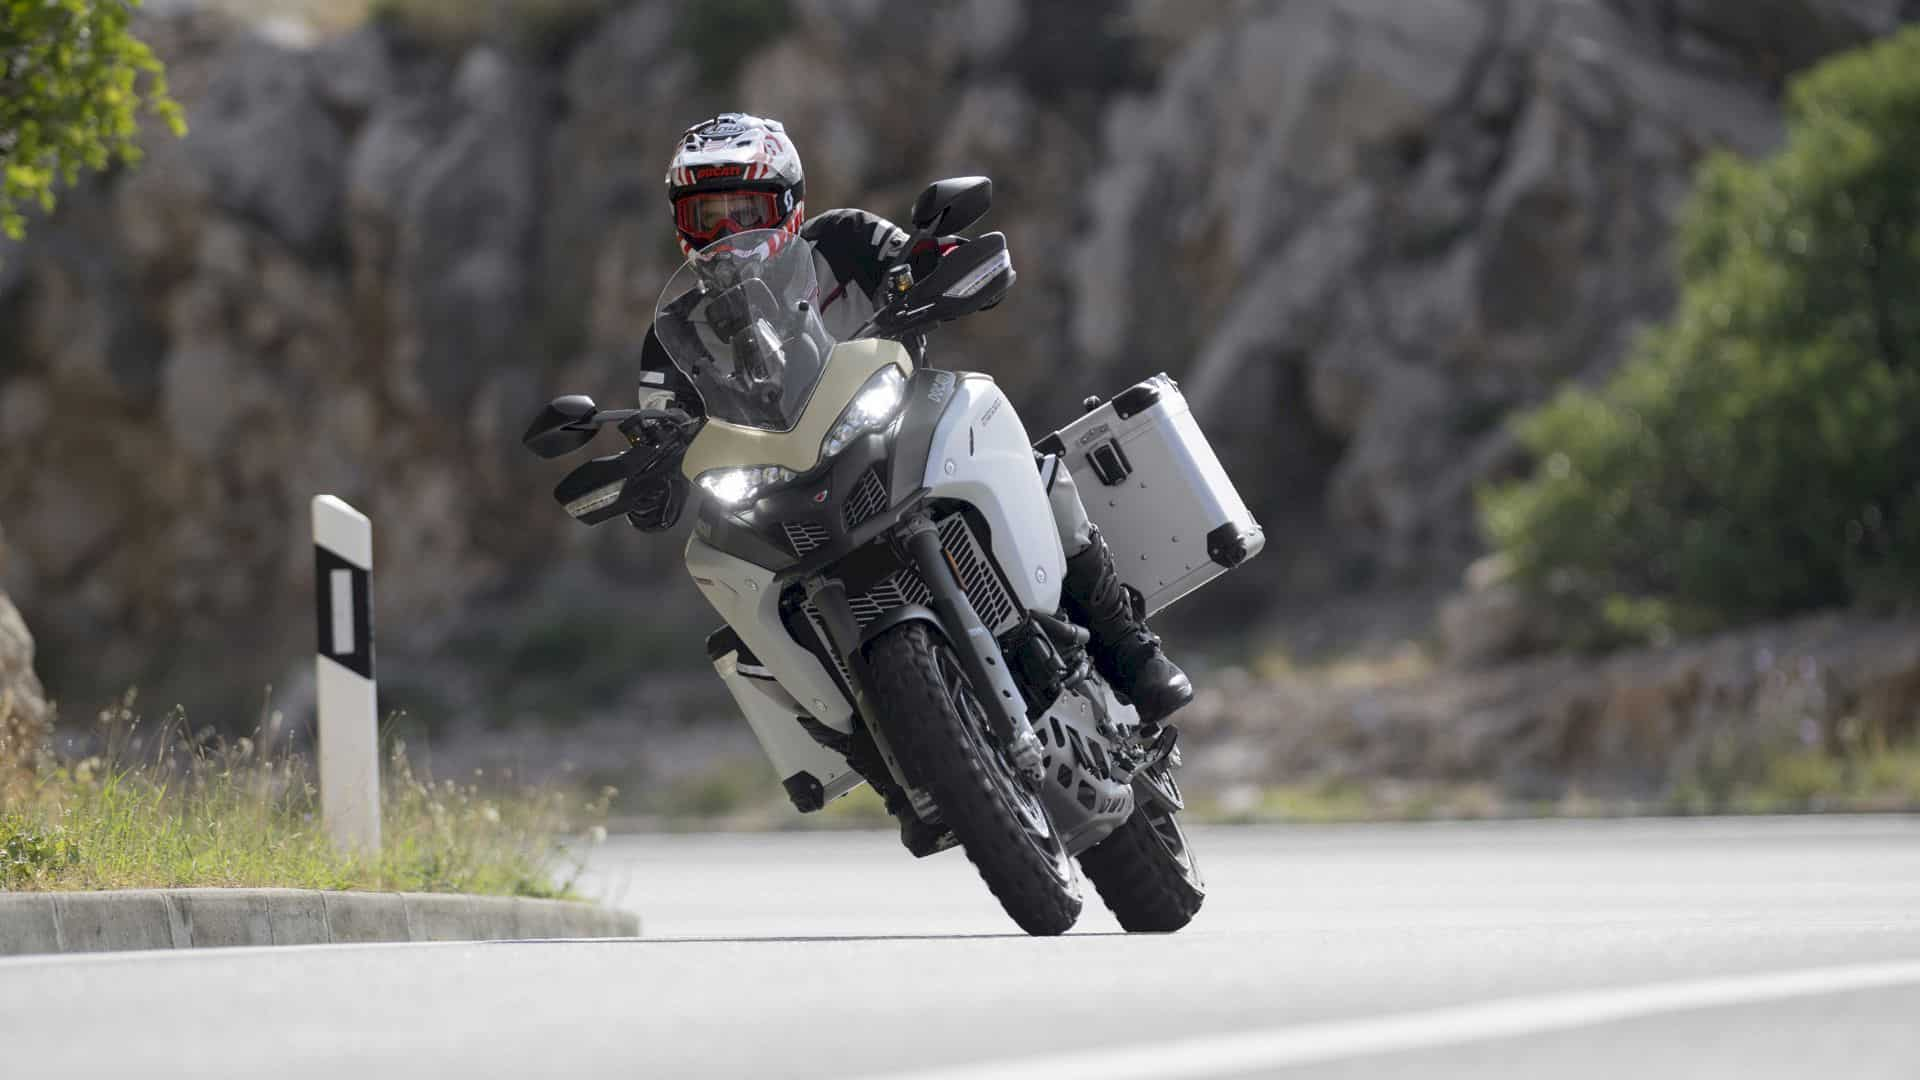 Ducati Multistrada 1260 Enduro 11